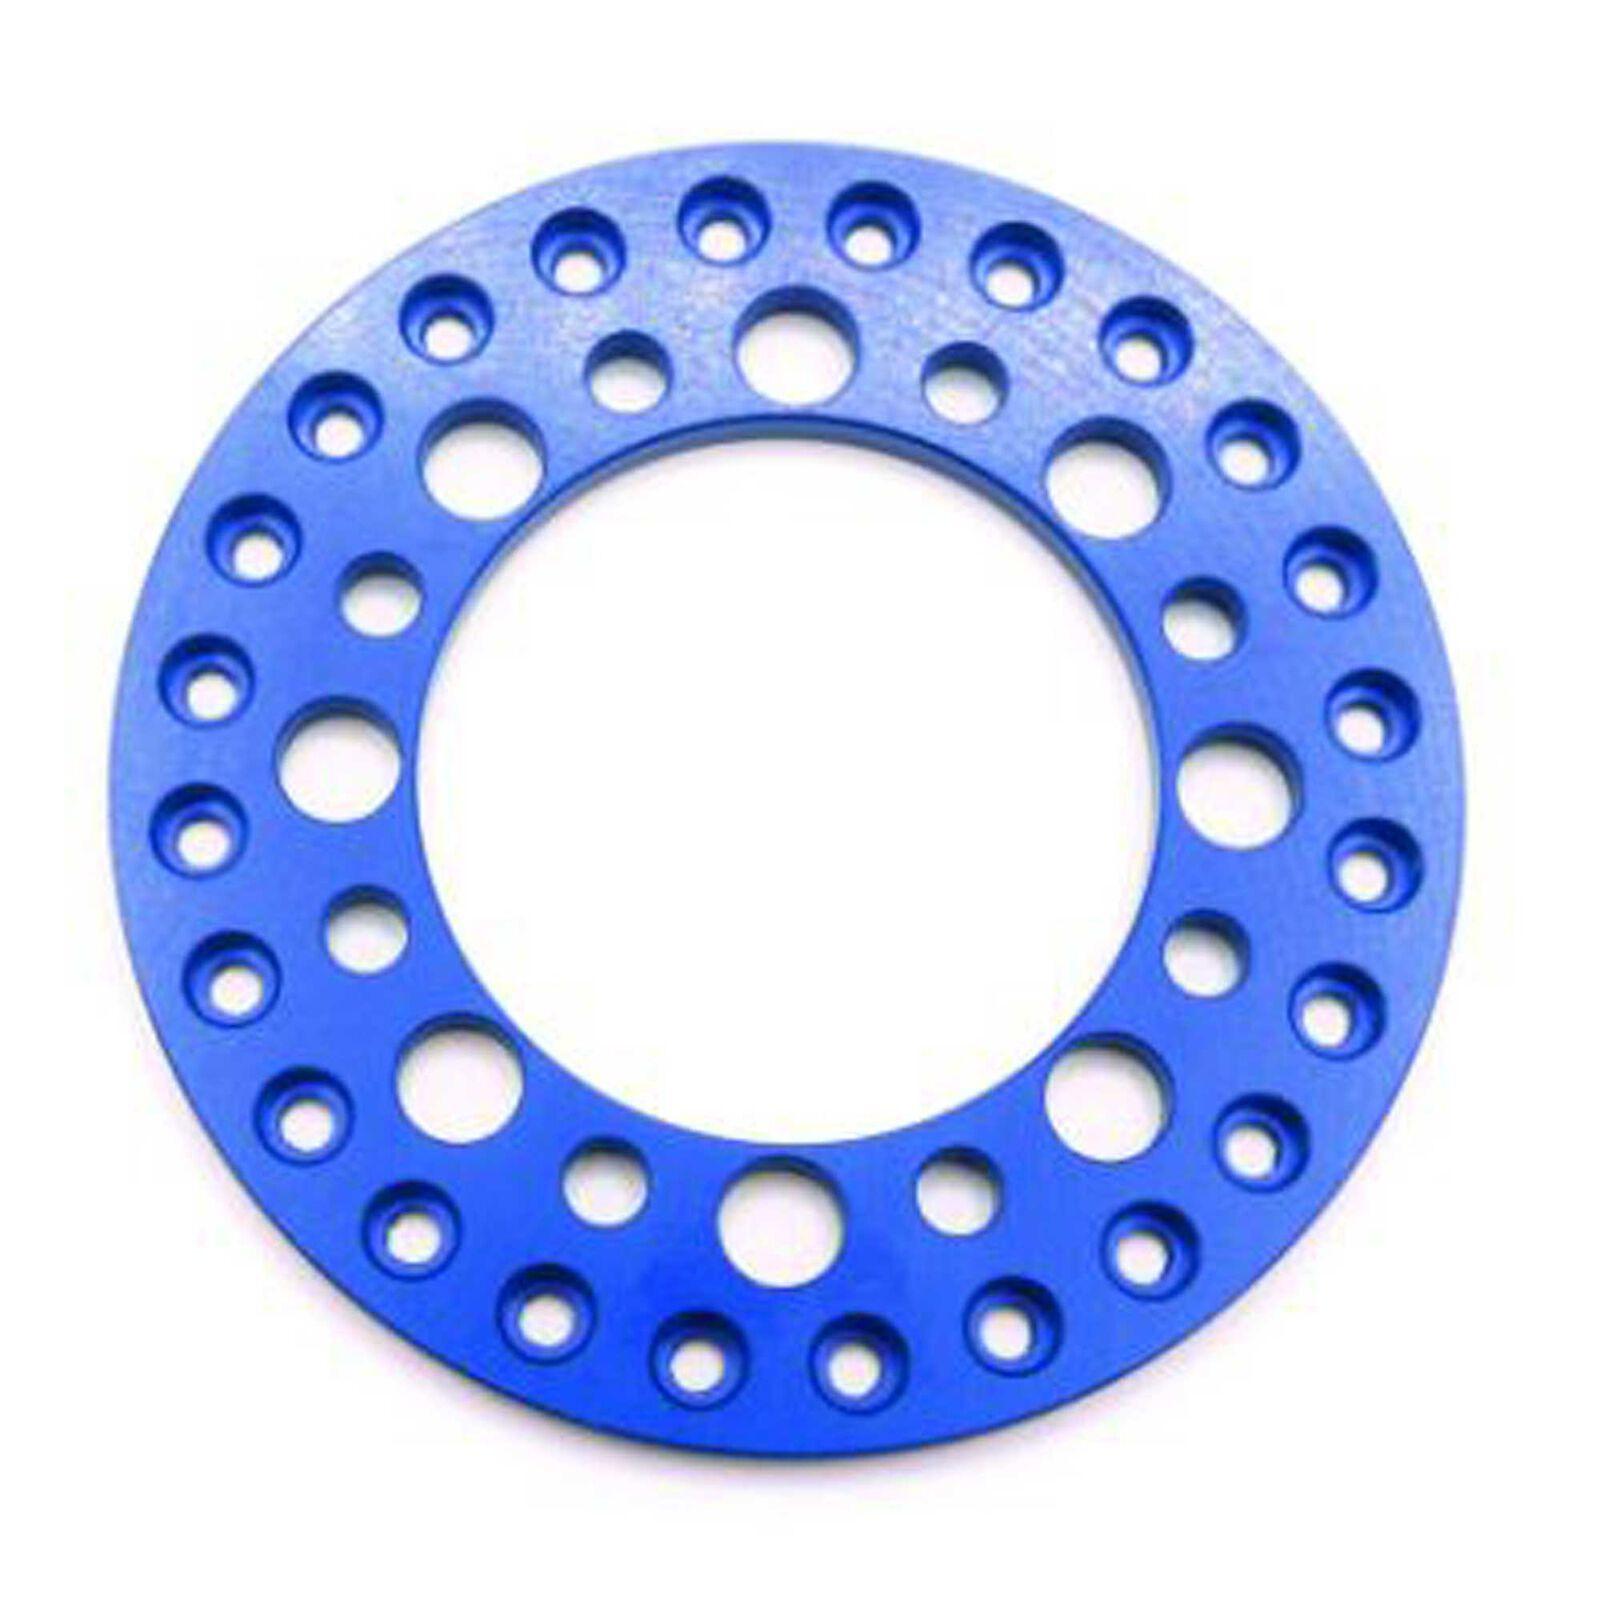 1.9 Holy Beadlock Blue Anodized